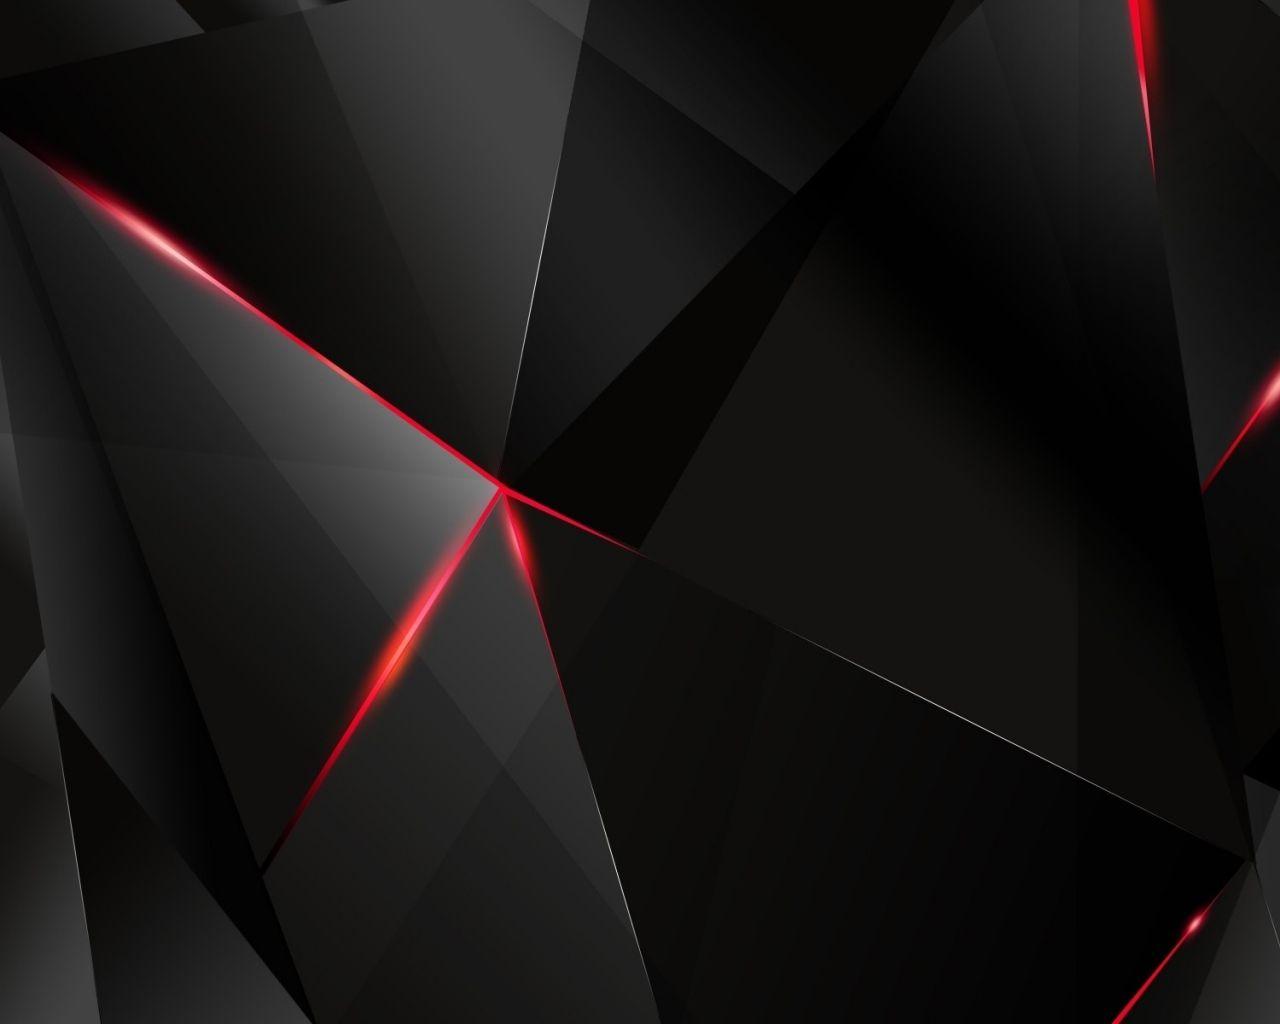 1280x1024 Desktop Wallpapers Hd 1280x1024 Free Desktop Black Wallpaper Cellphone Wallpaper Backgrounds Light In The Dark